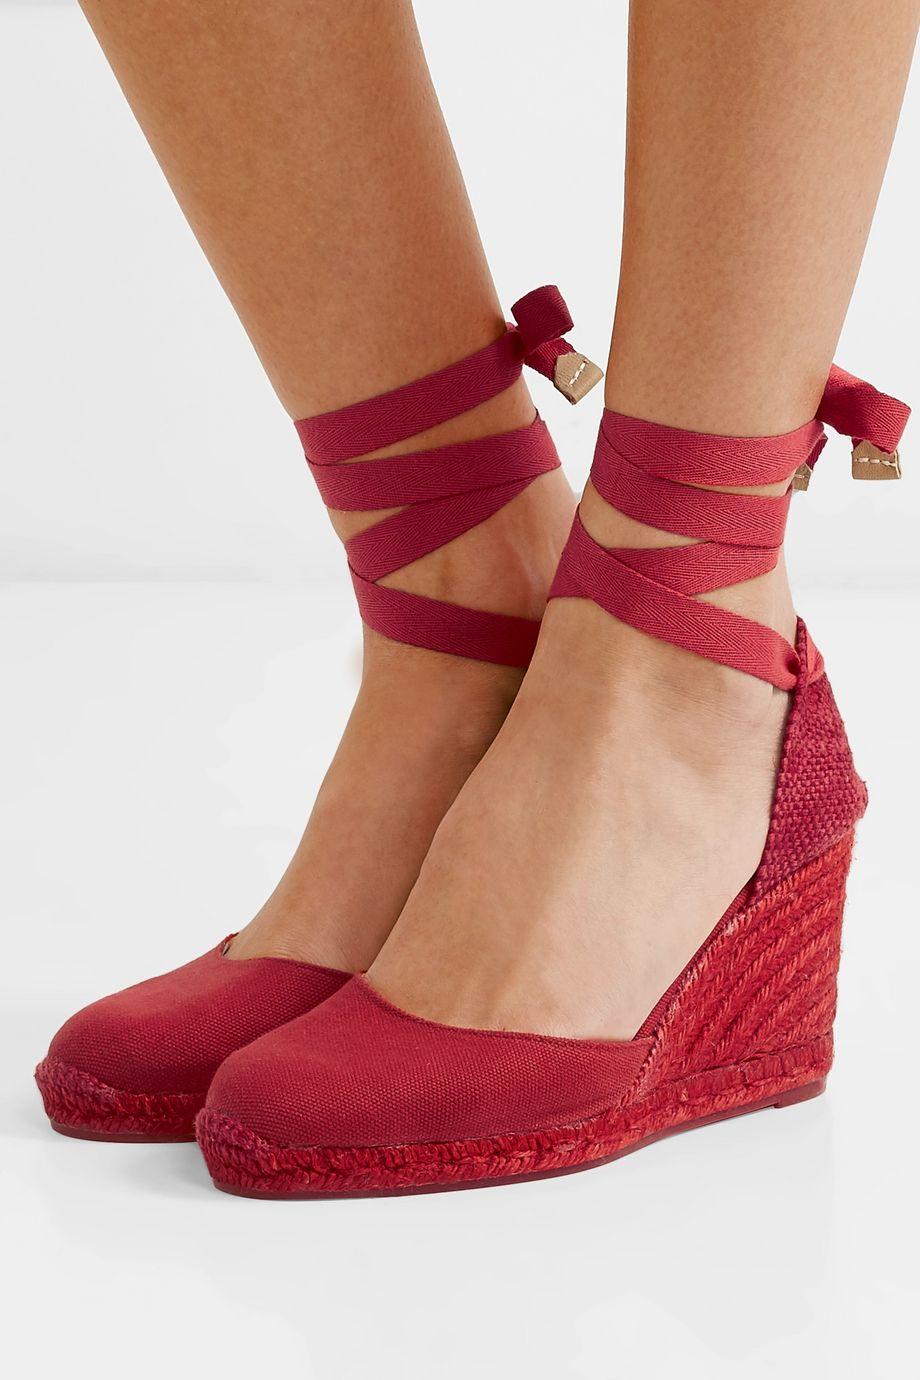 Castañer Carina 80 帆布坡跟麻底鞋